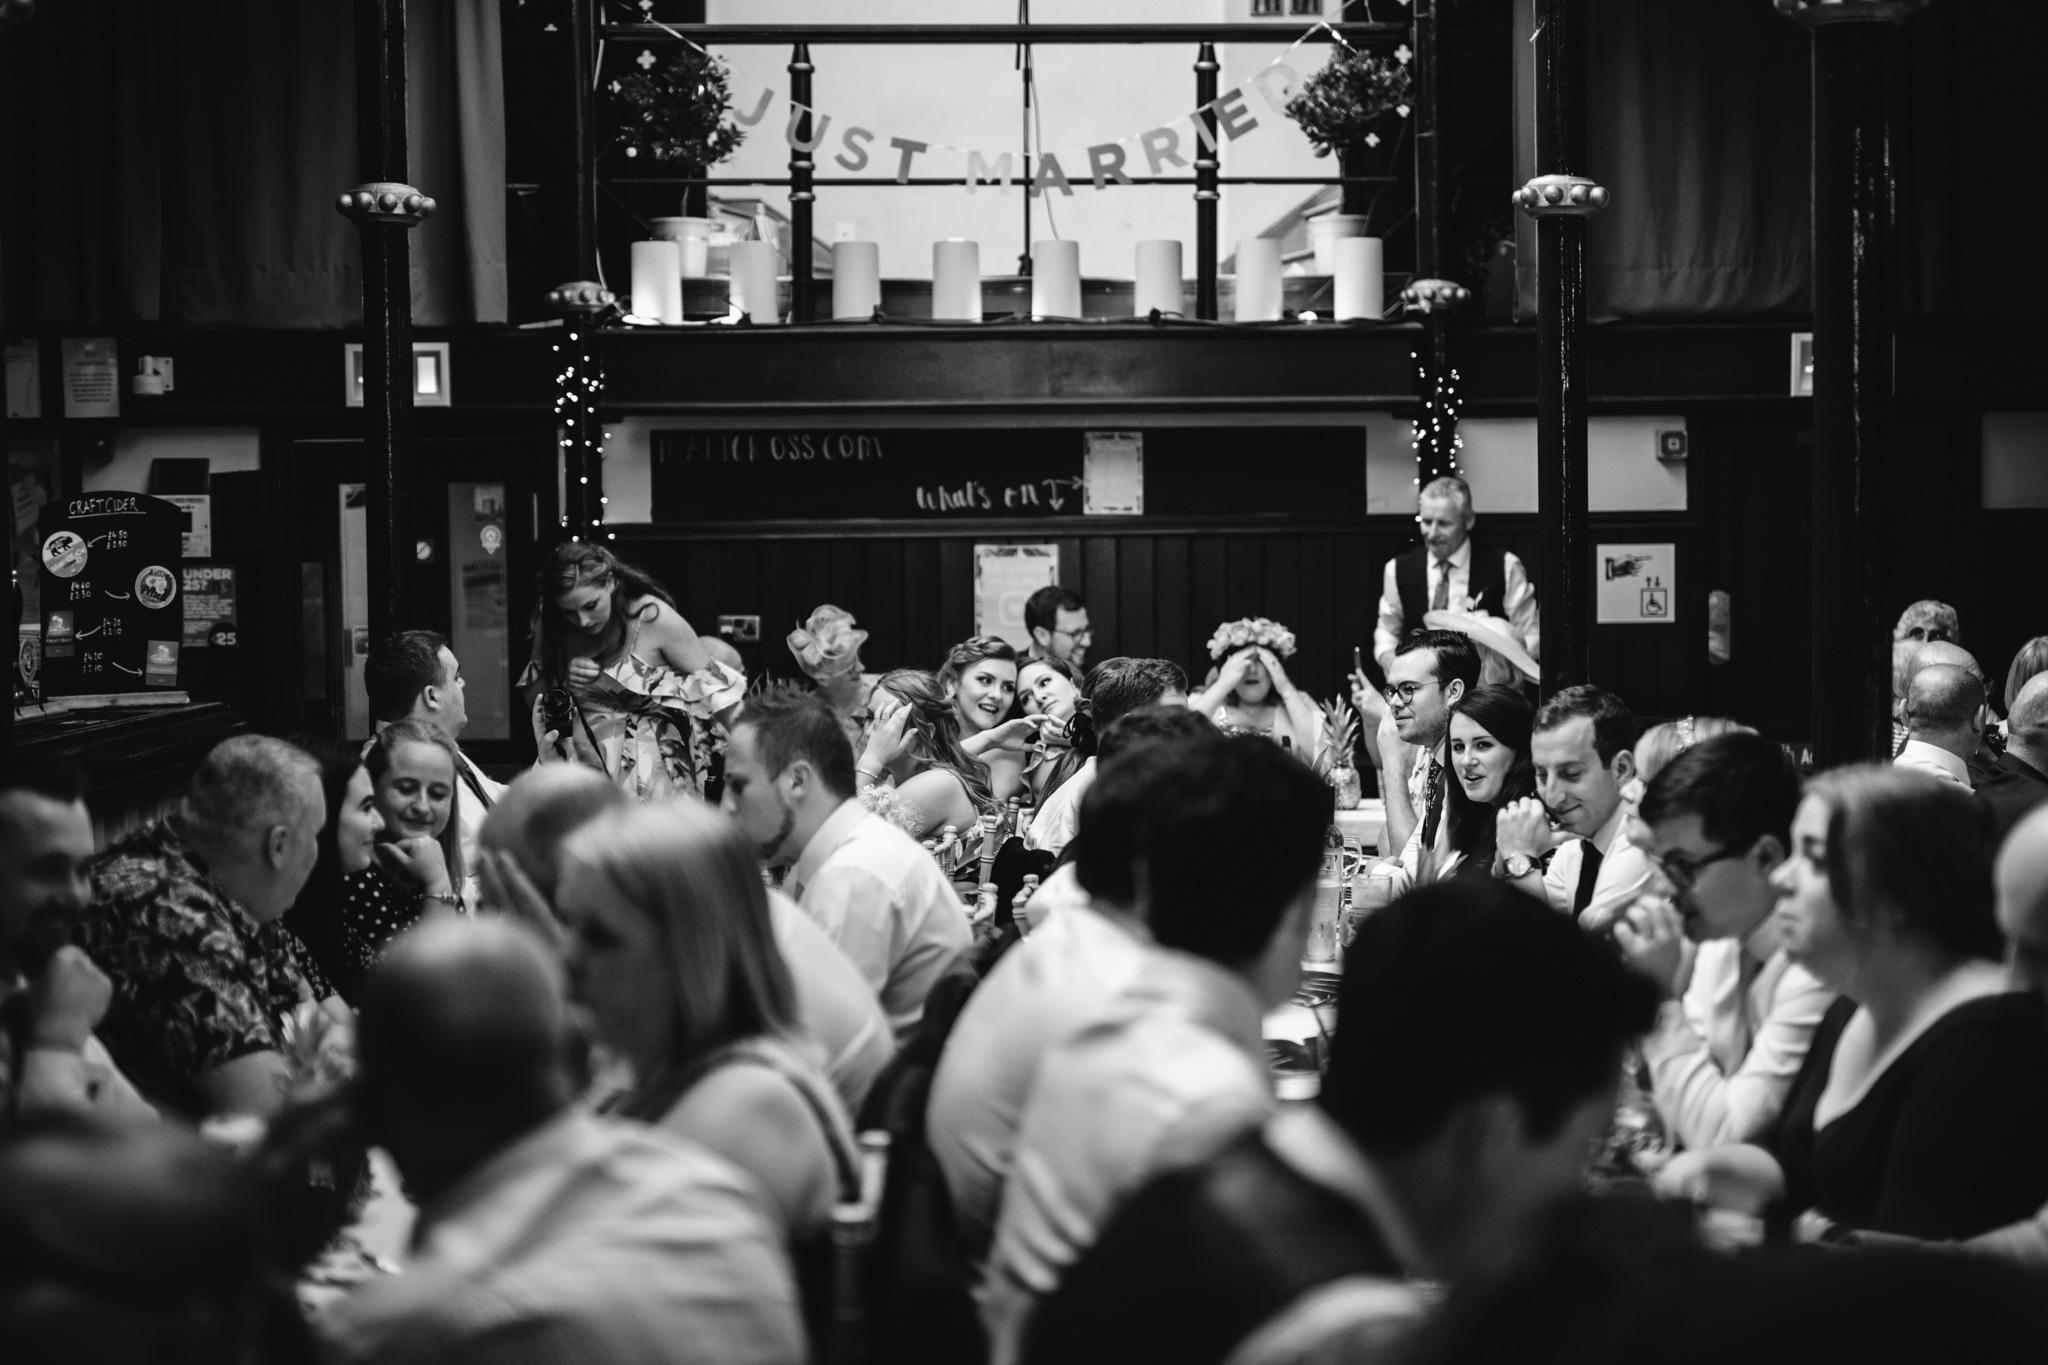 derbyshire-wedding-photographer-videographer-camera-hannah-62.jpg